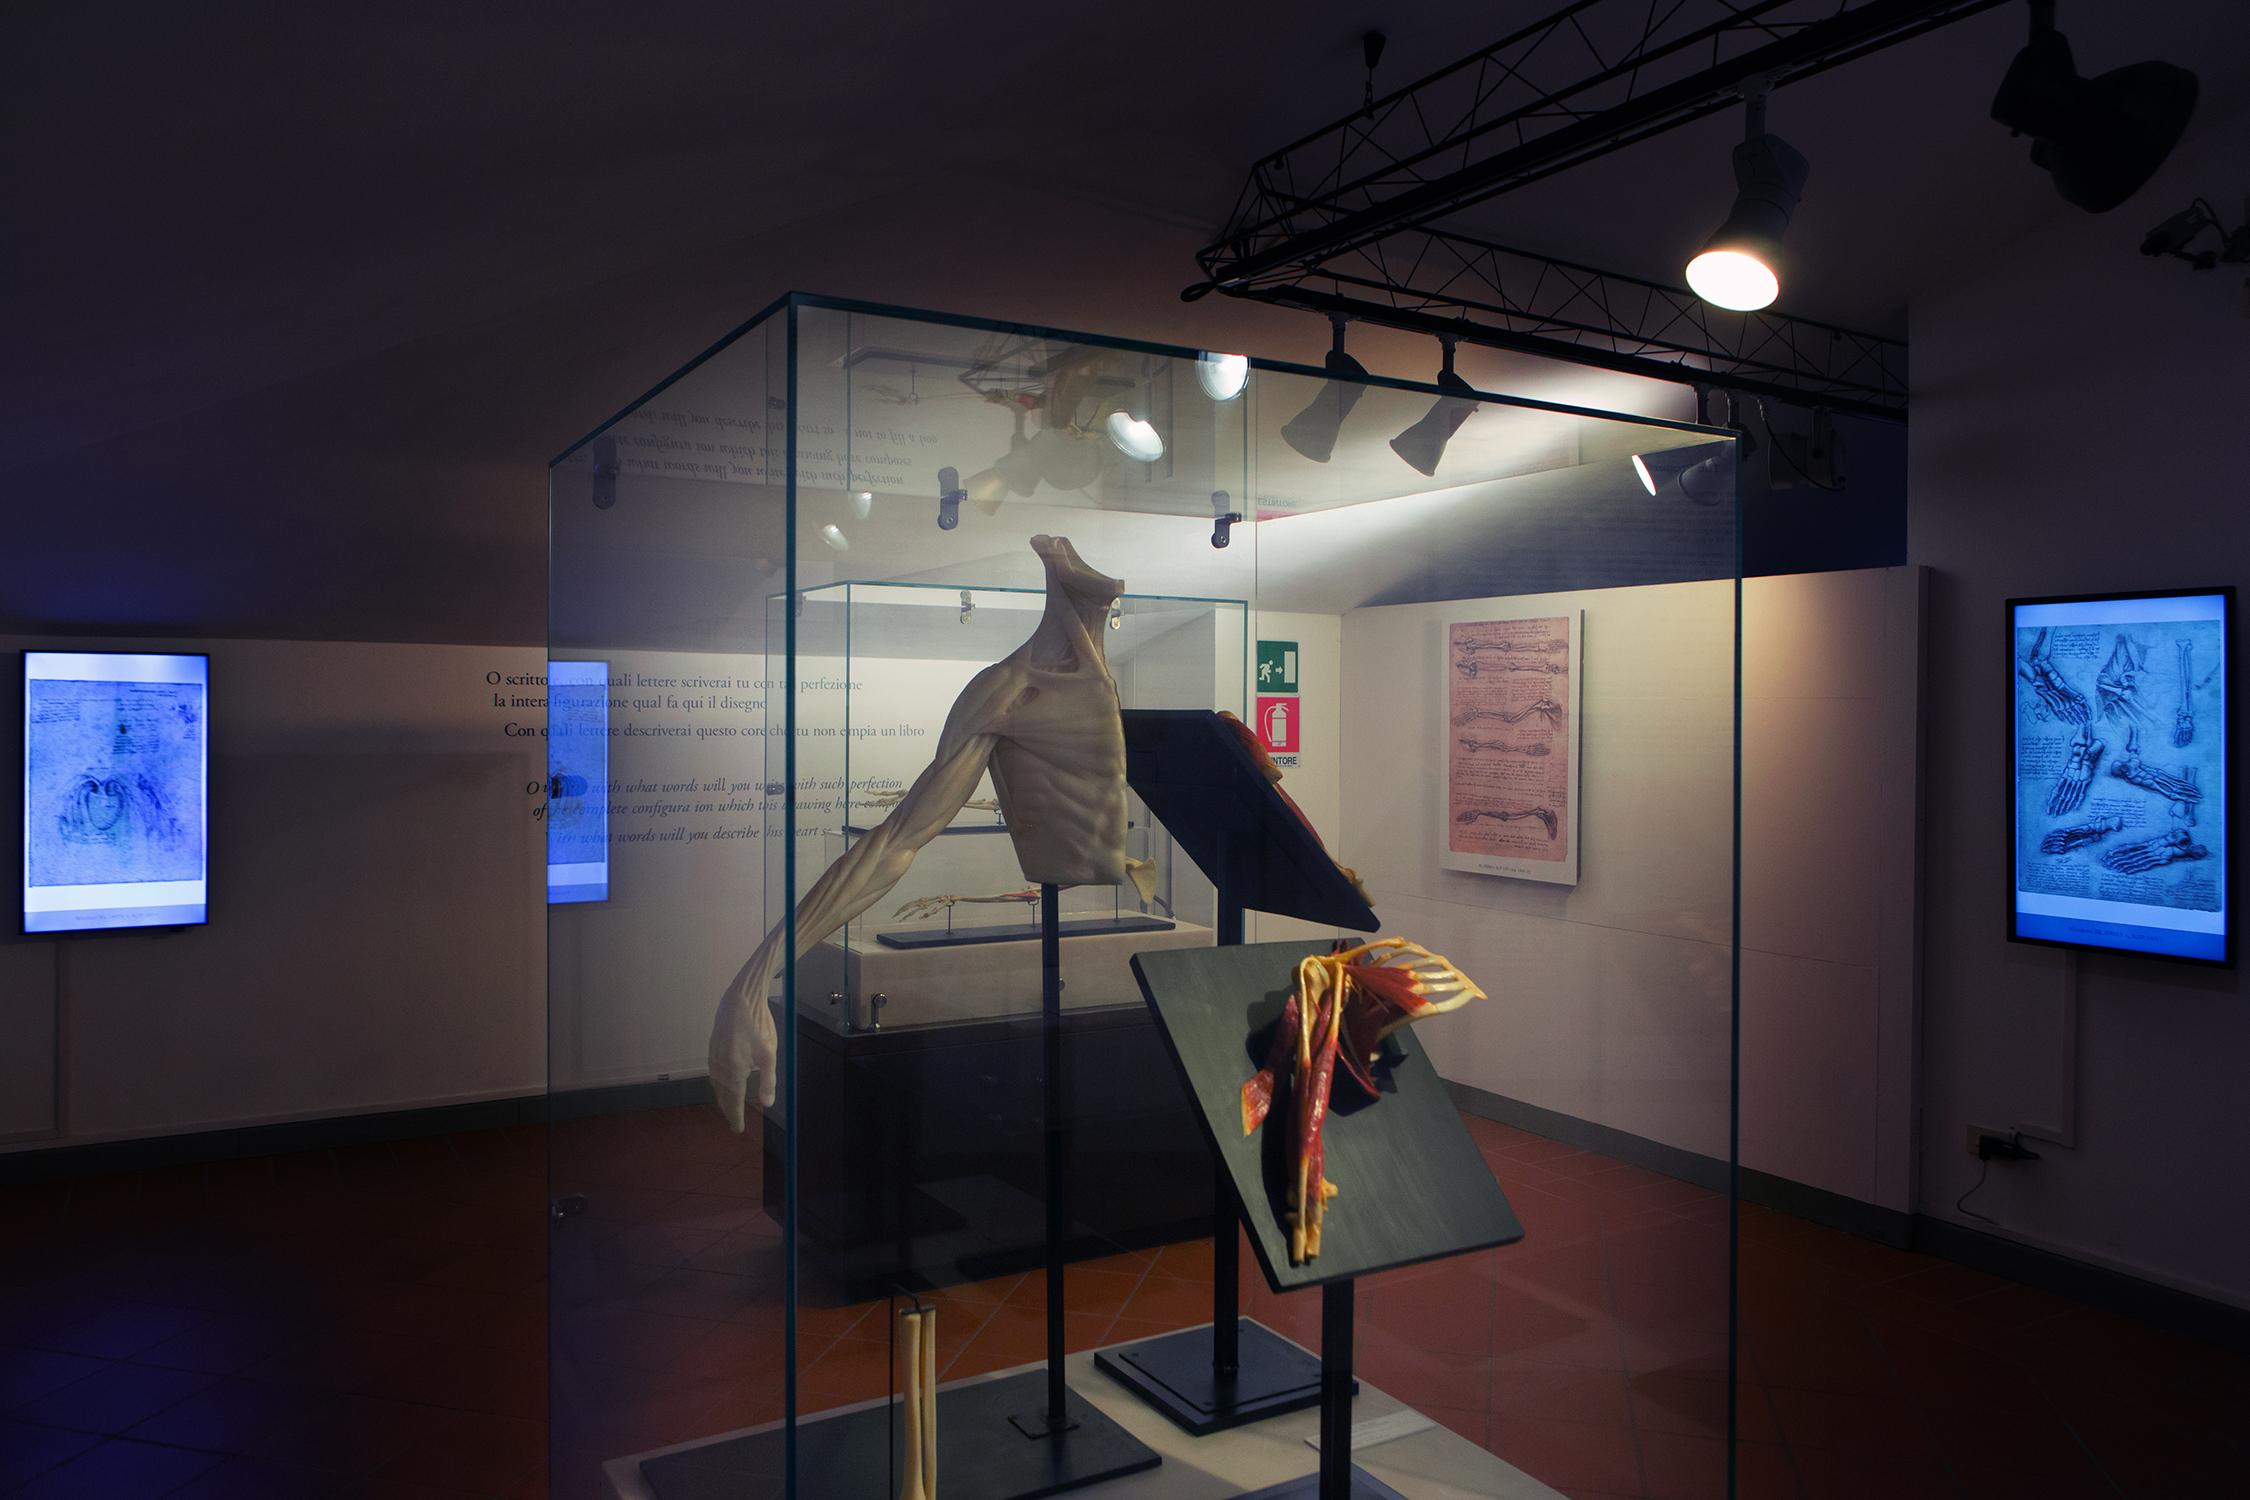 Museo leonardiano di Vinci (FI).